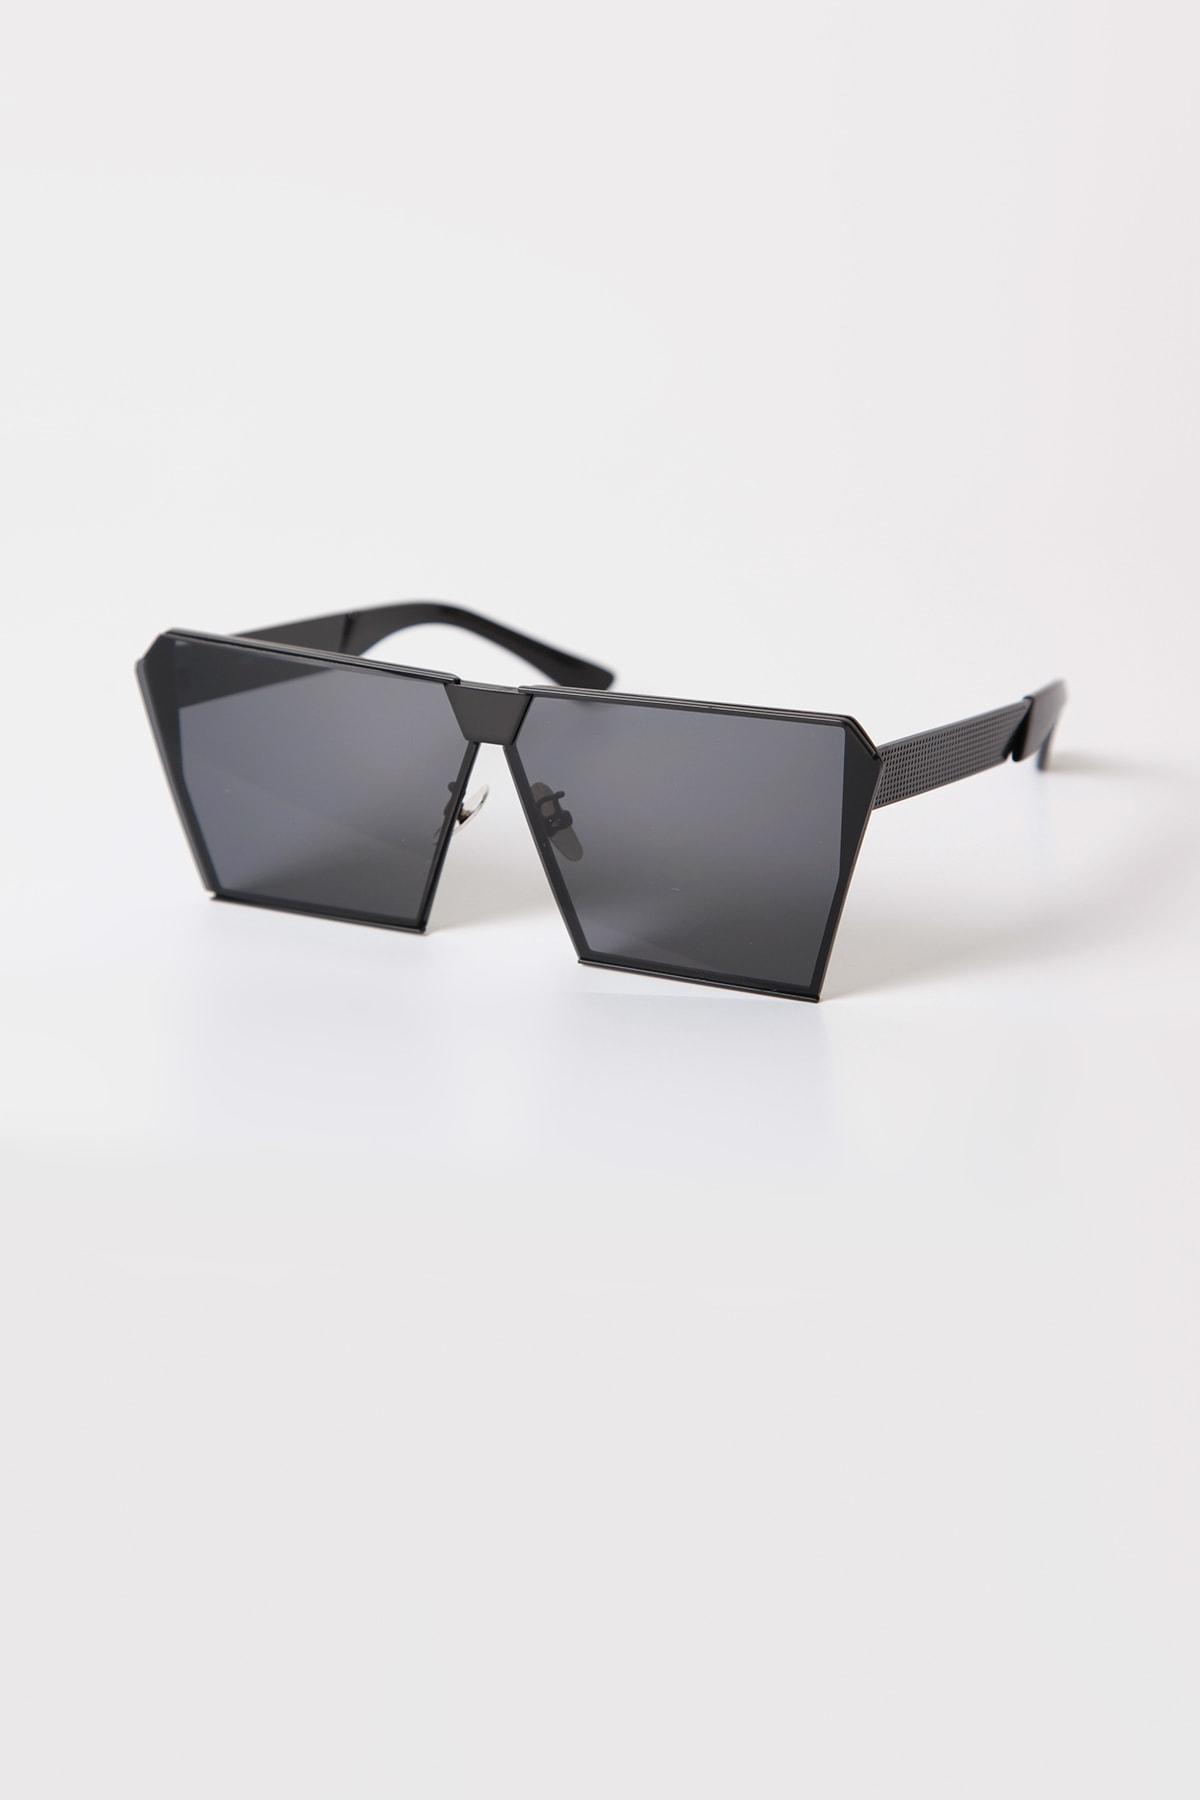 عینک آفتابی زنانه شیک برند Kapin رنگ مشکی کد ty46740218